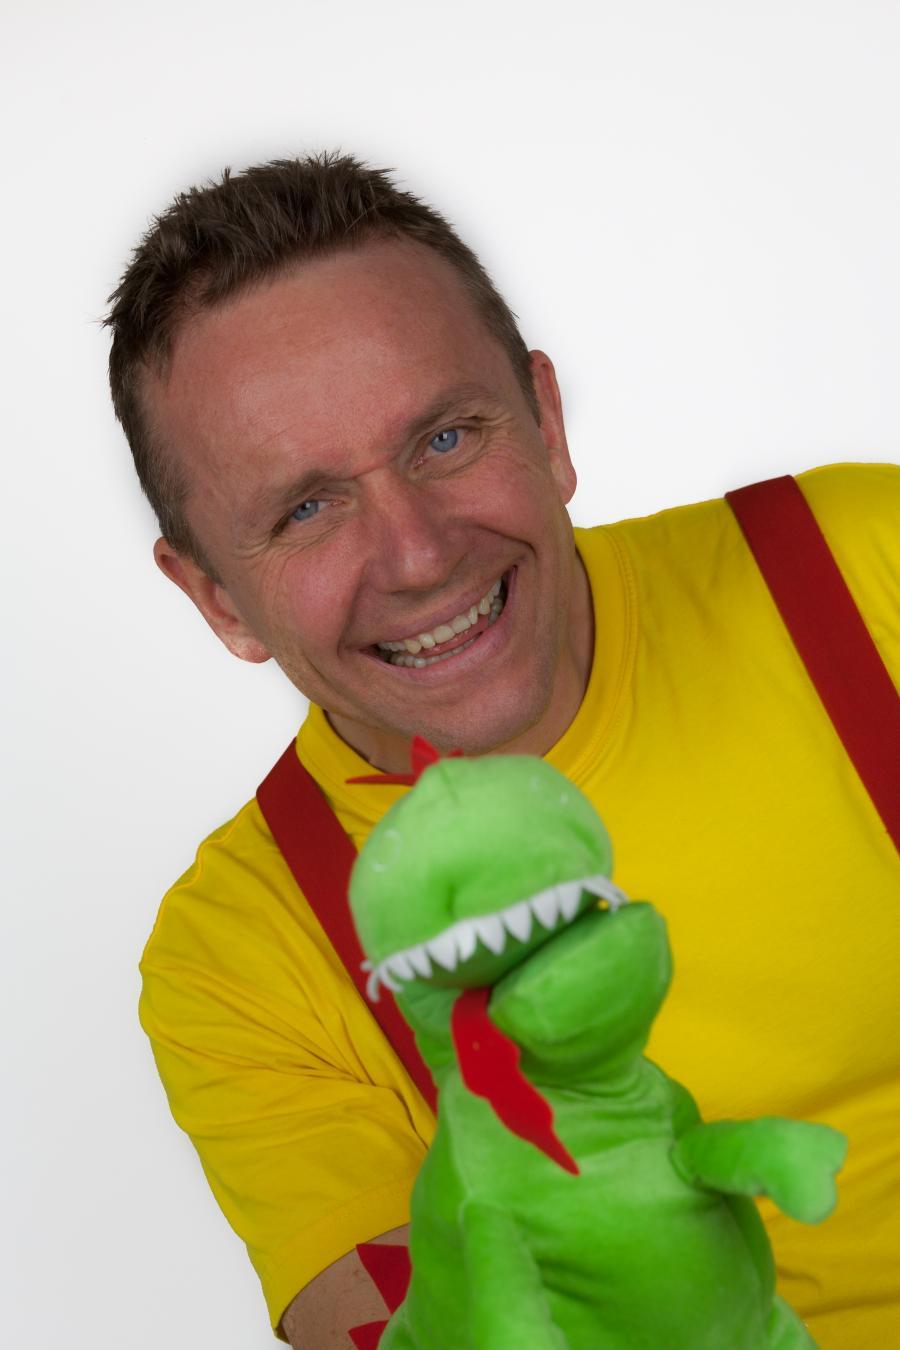 En mand med plys krokodille